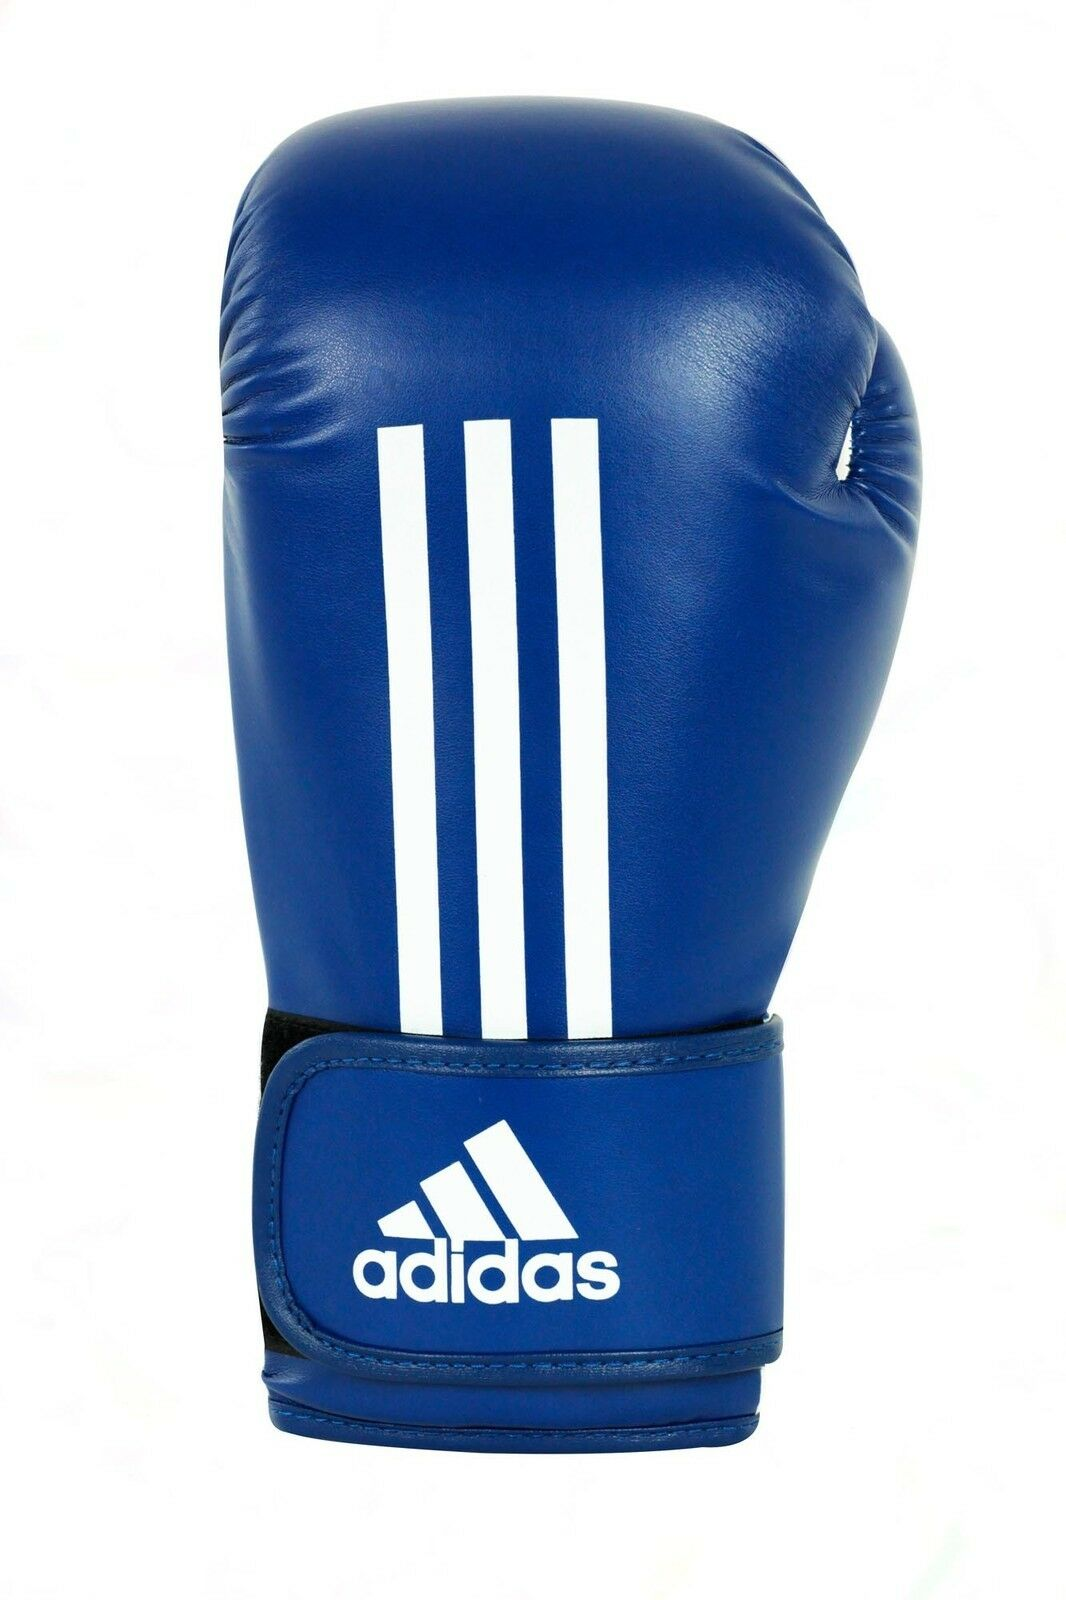 Adidas Boxhandschuhe Energy 100 blau ADIEBG100B - Box Handschuh - - - Boxen aa6568